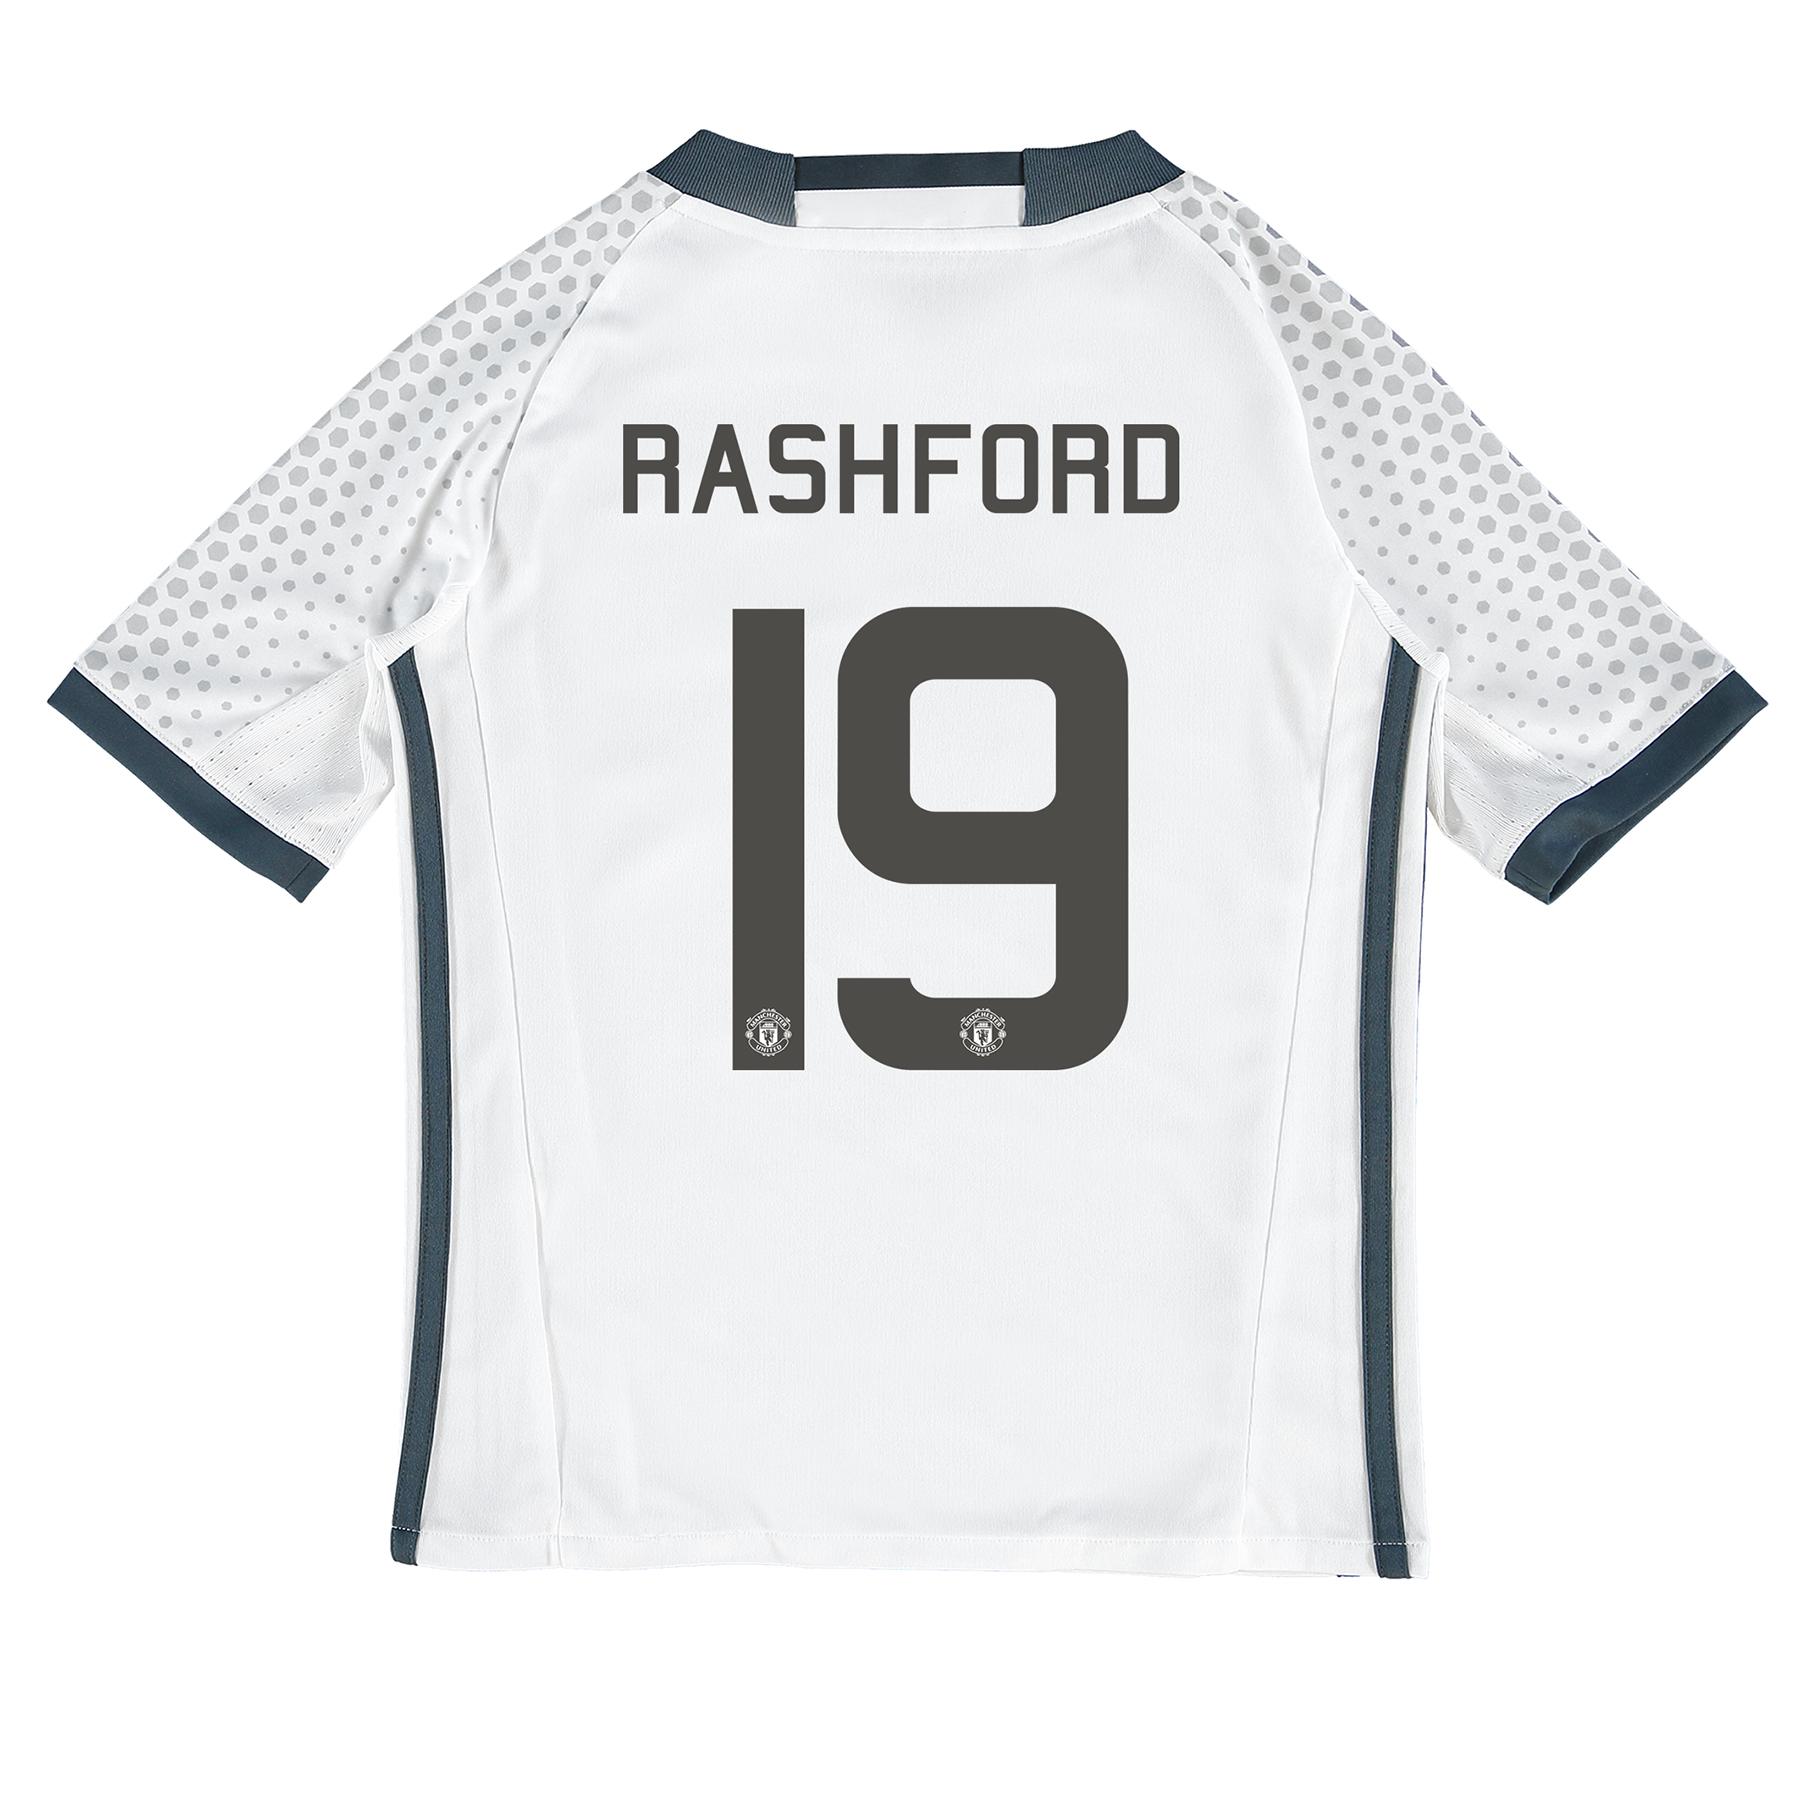 Manchester United Cup Third Shirt 2016-17 - Kids with Rashford 19 prin